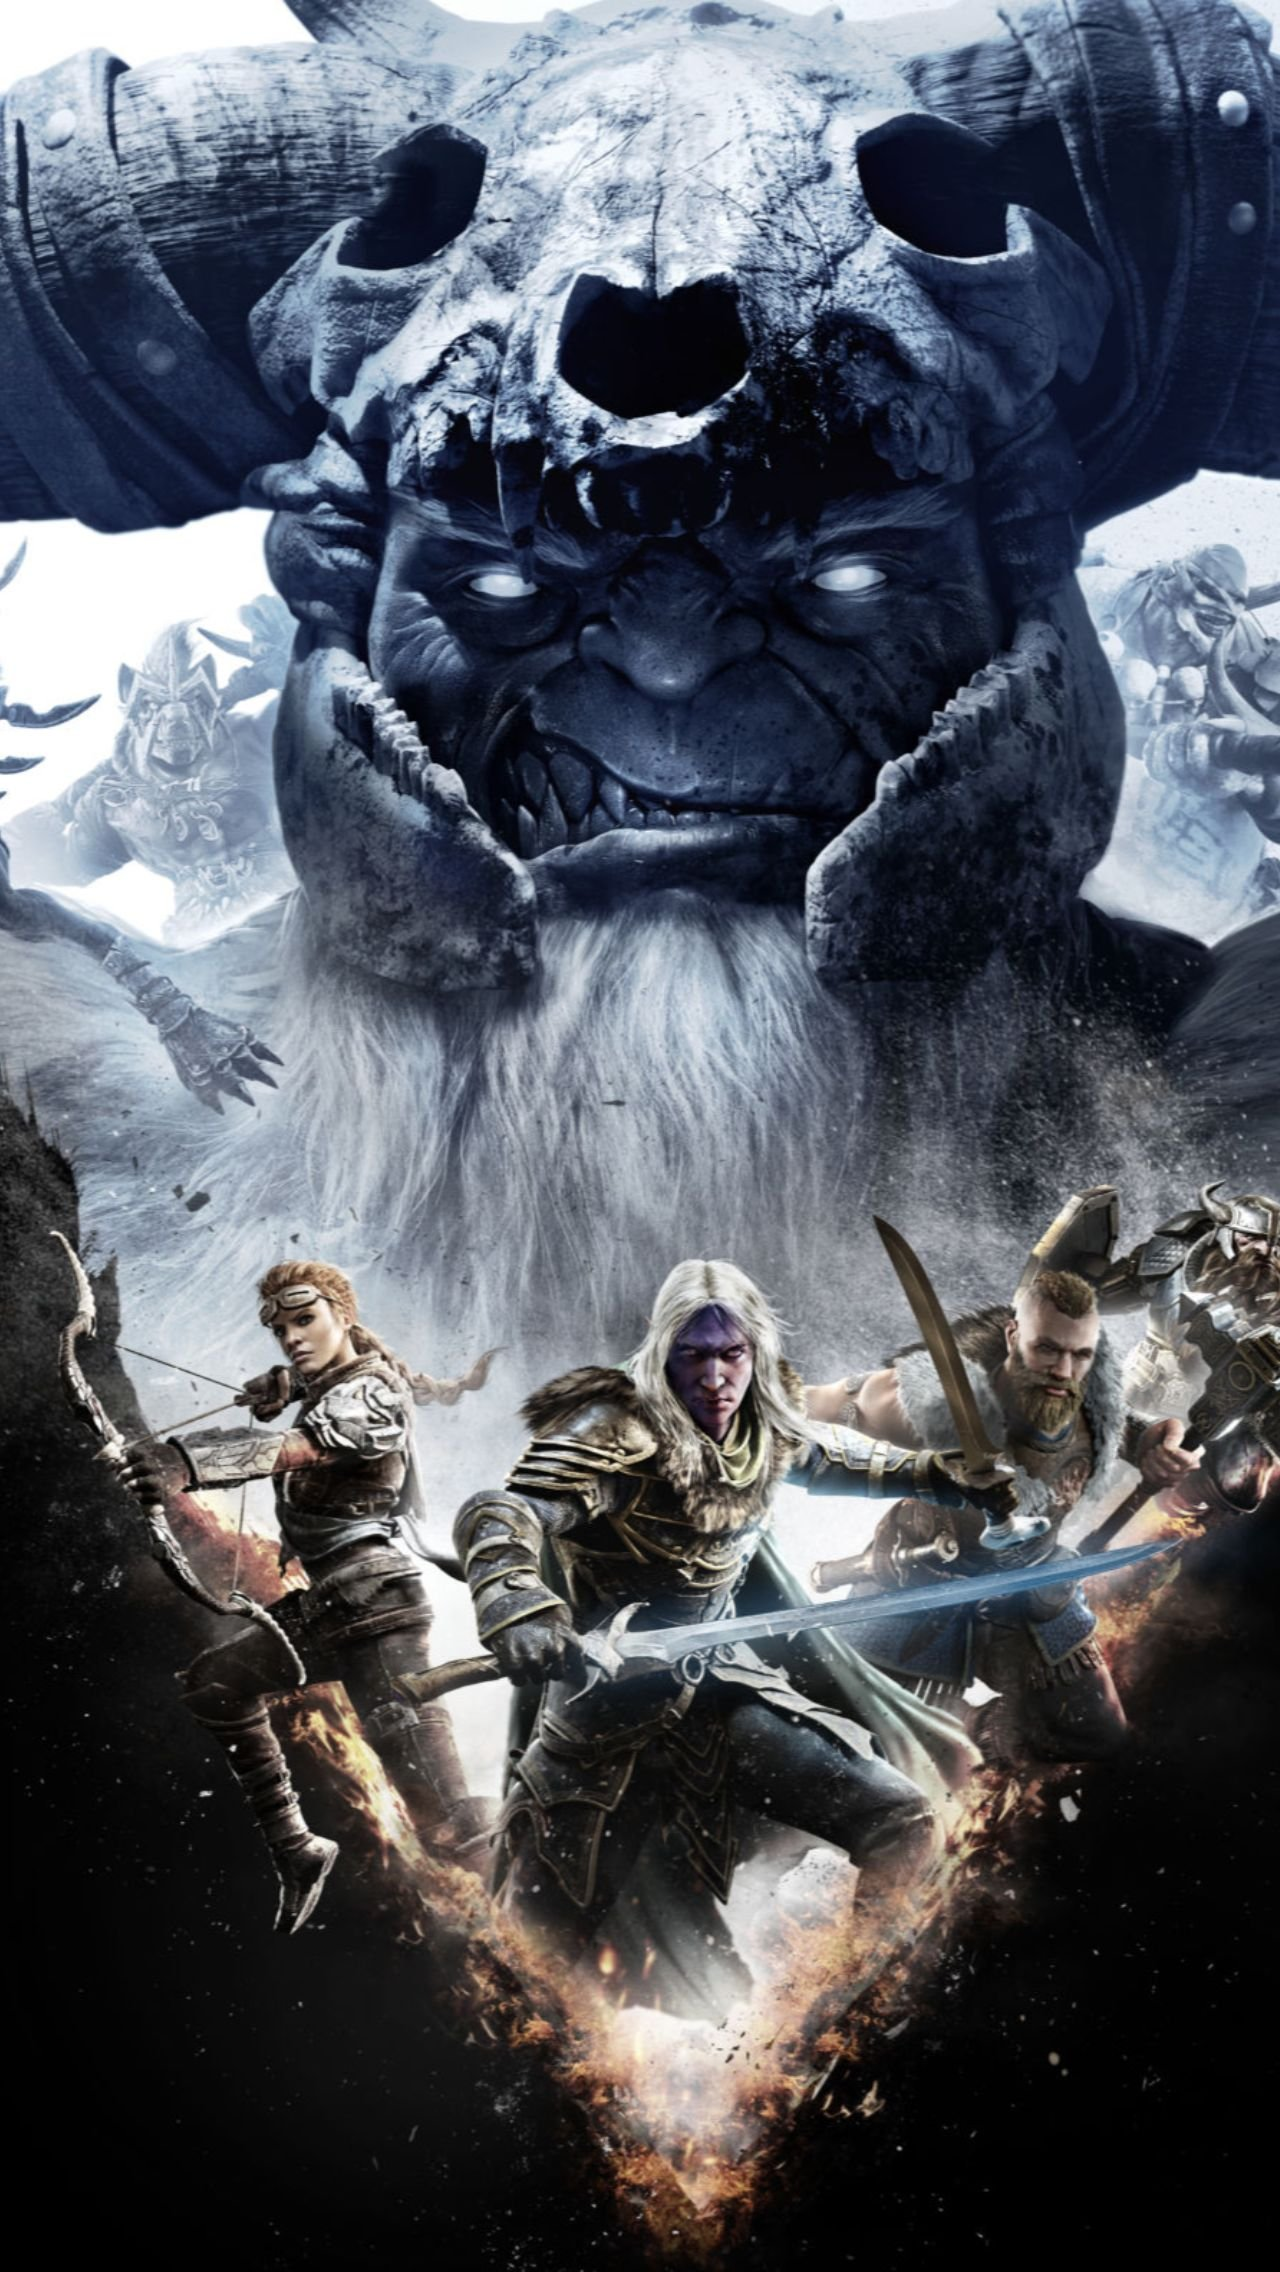 Dark Alliance (22 июня на ПК, PS4, PS5, Xbox One, Xbox Series)